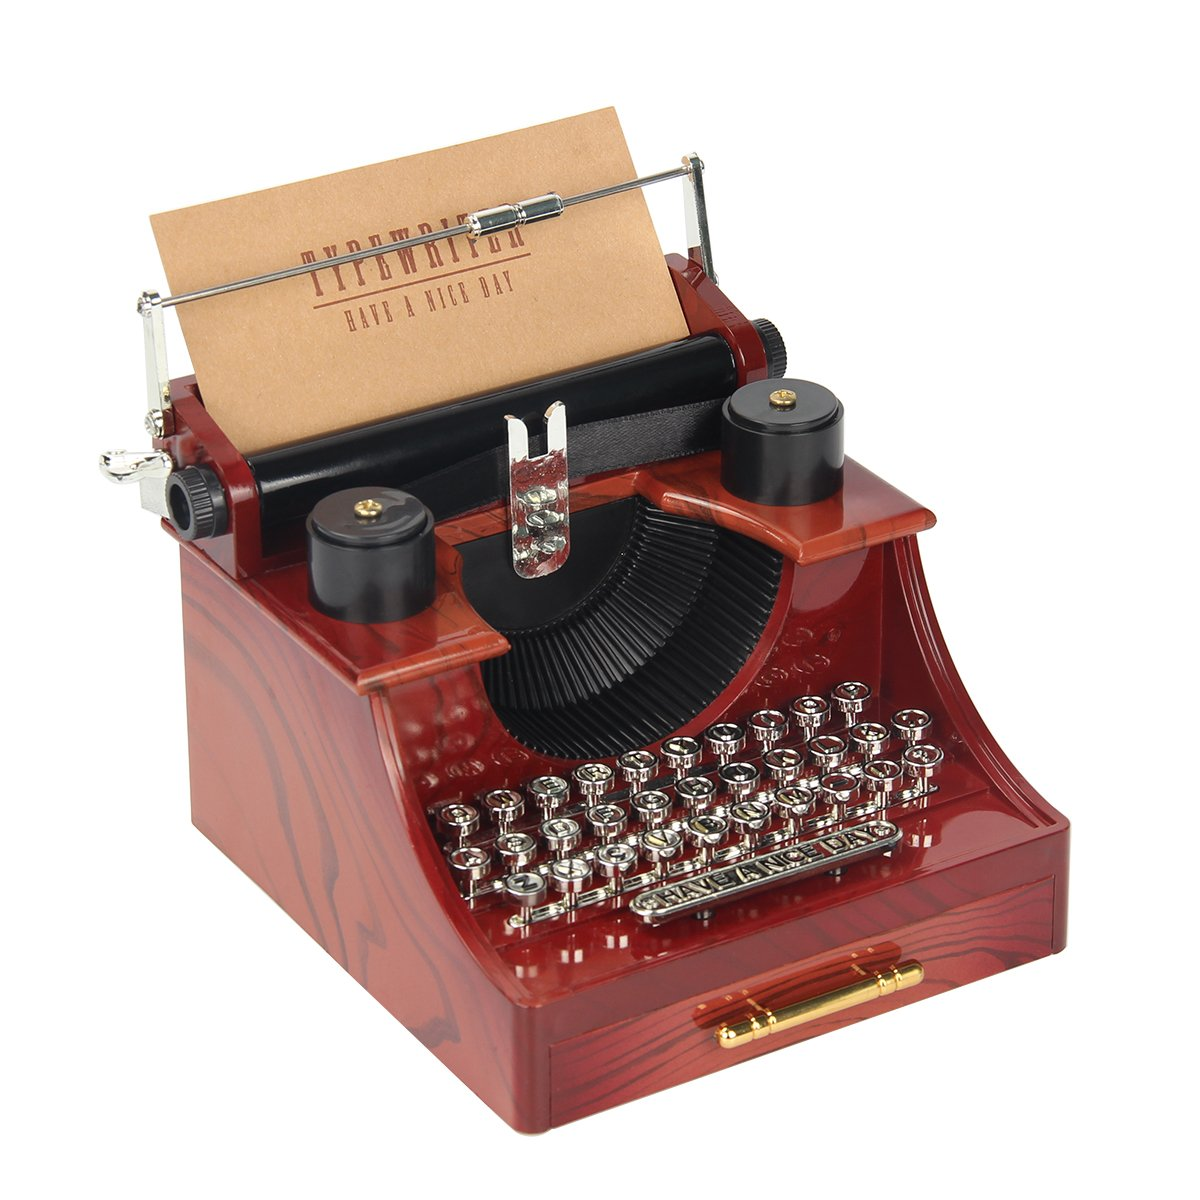 Kitchnexus Mini Cassetta Musica Vintage Simulazione Macchina da Cucire e Macchina da Scrivere Vintage Machine À Écrire